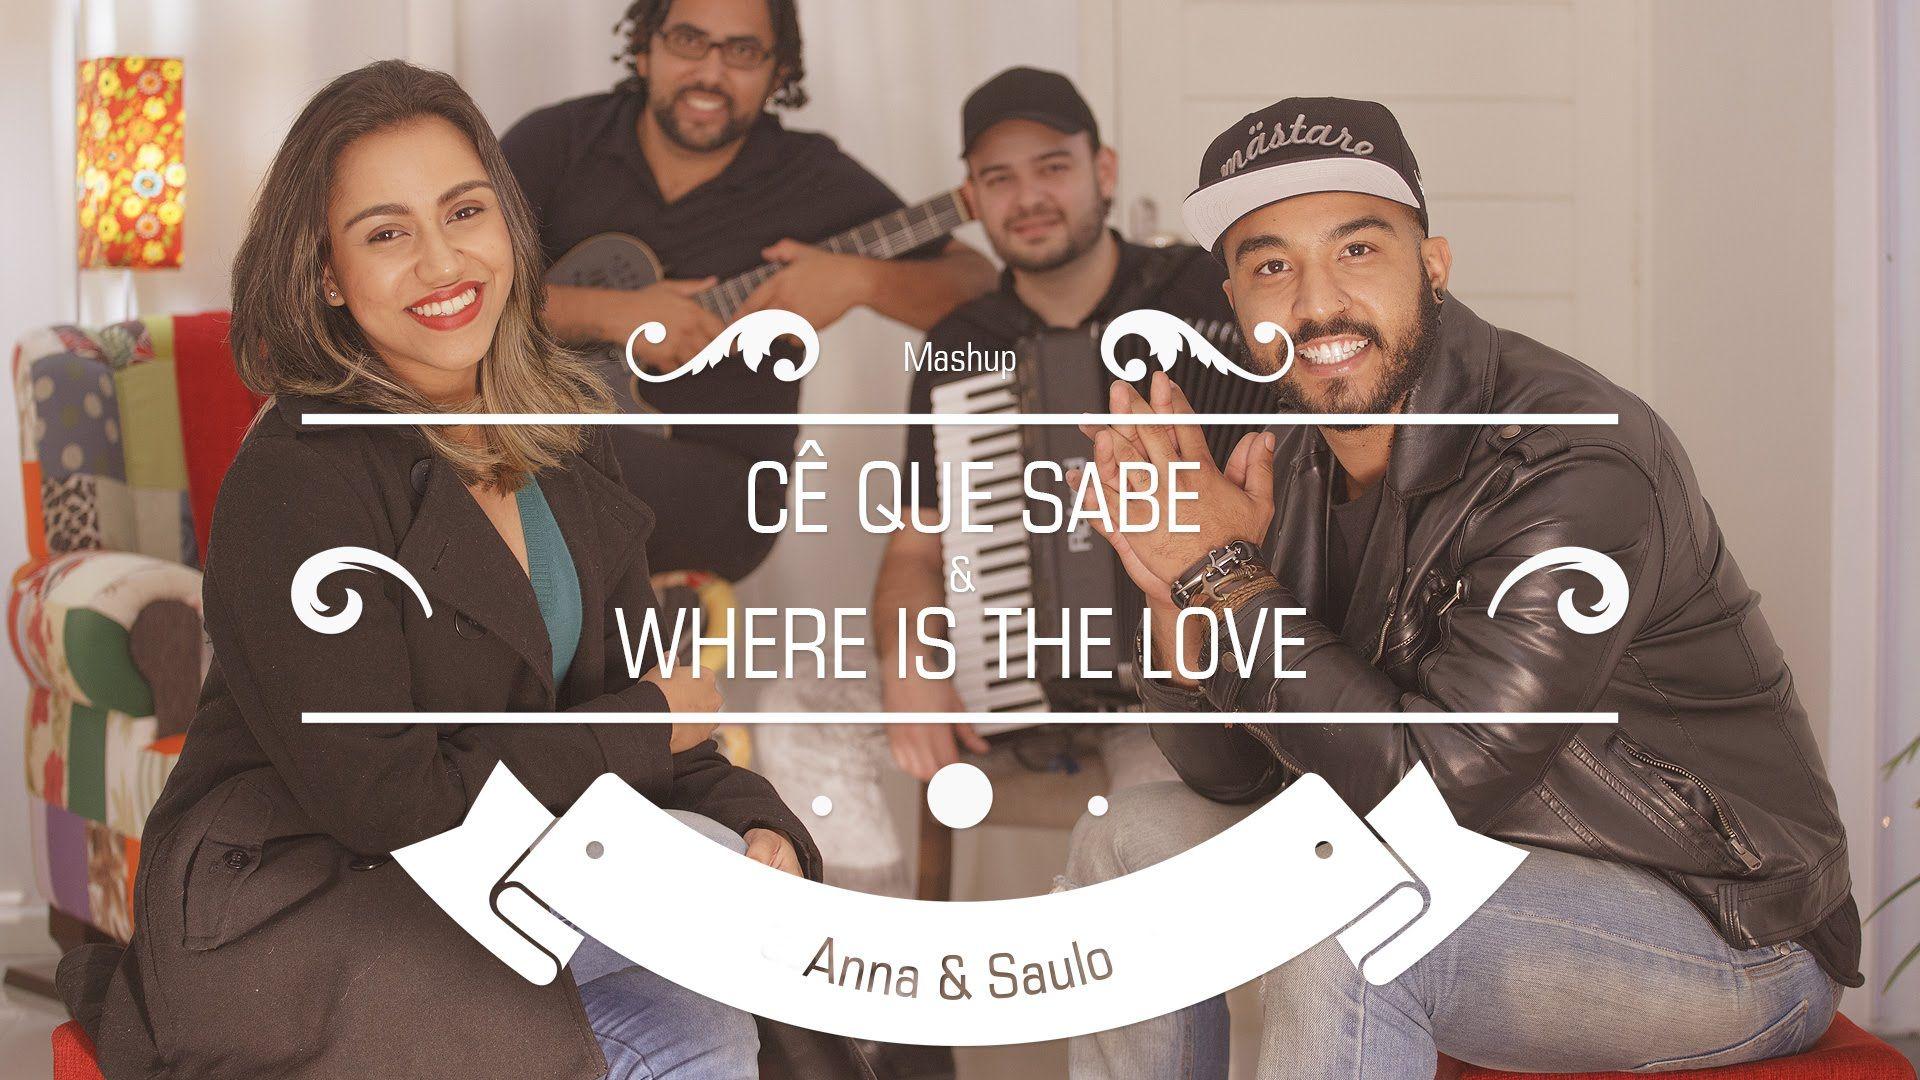 Anna E Saulo Mashup Ce Que Sabe Where Is The Love Saulo